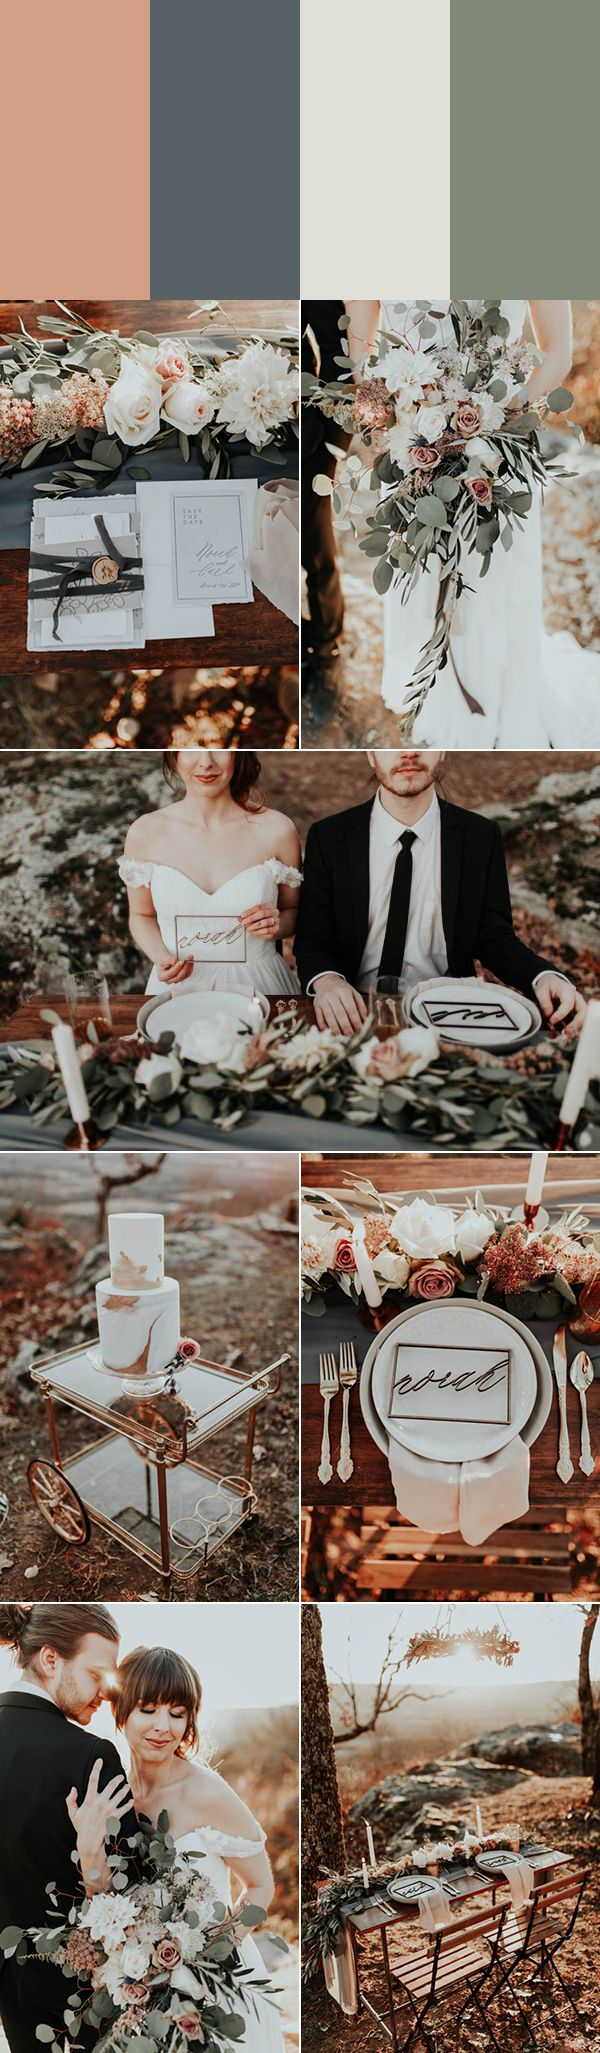 5 Sweet Spring Wedding Color Palette Ideas | Junebug Weddings